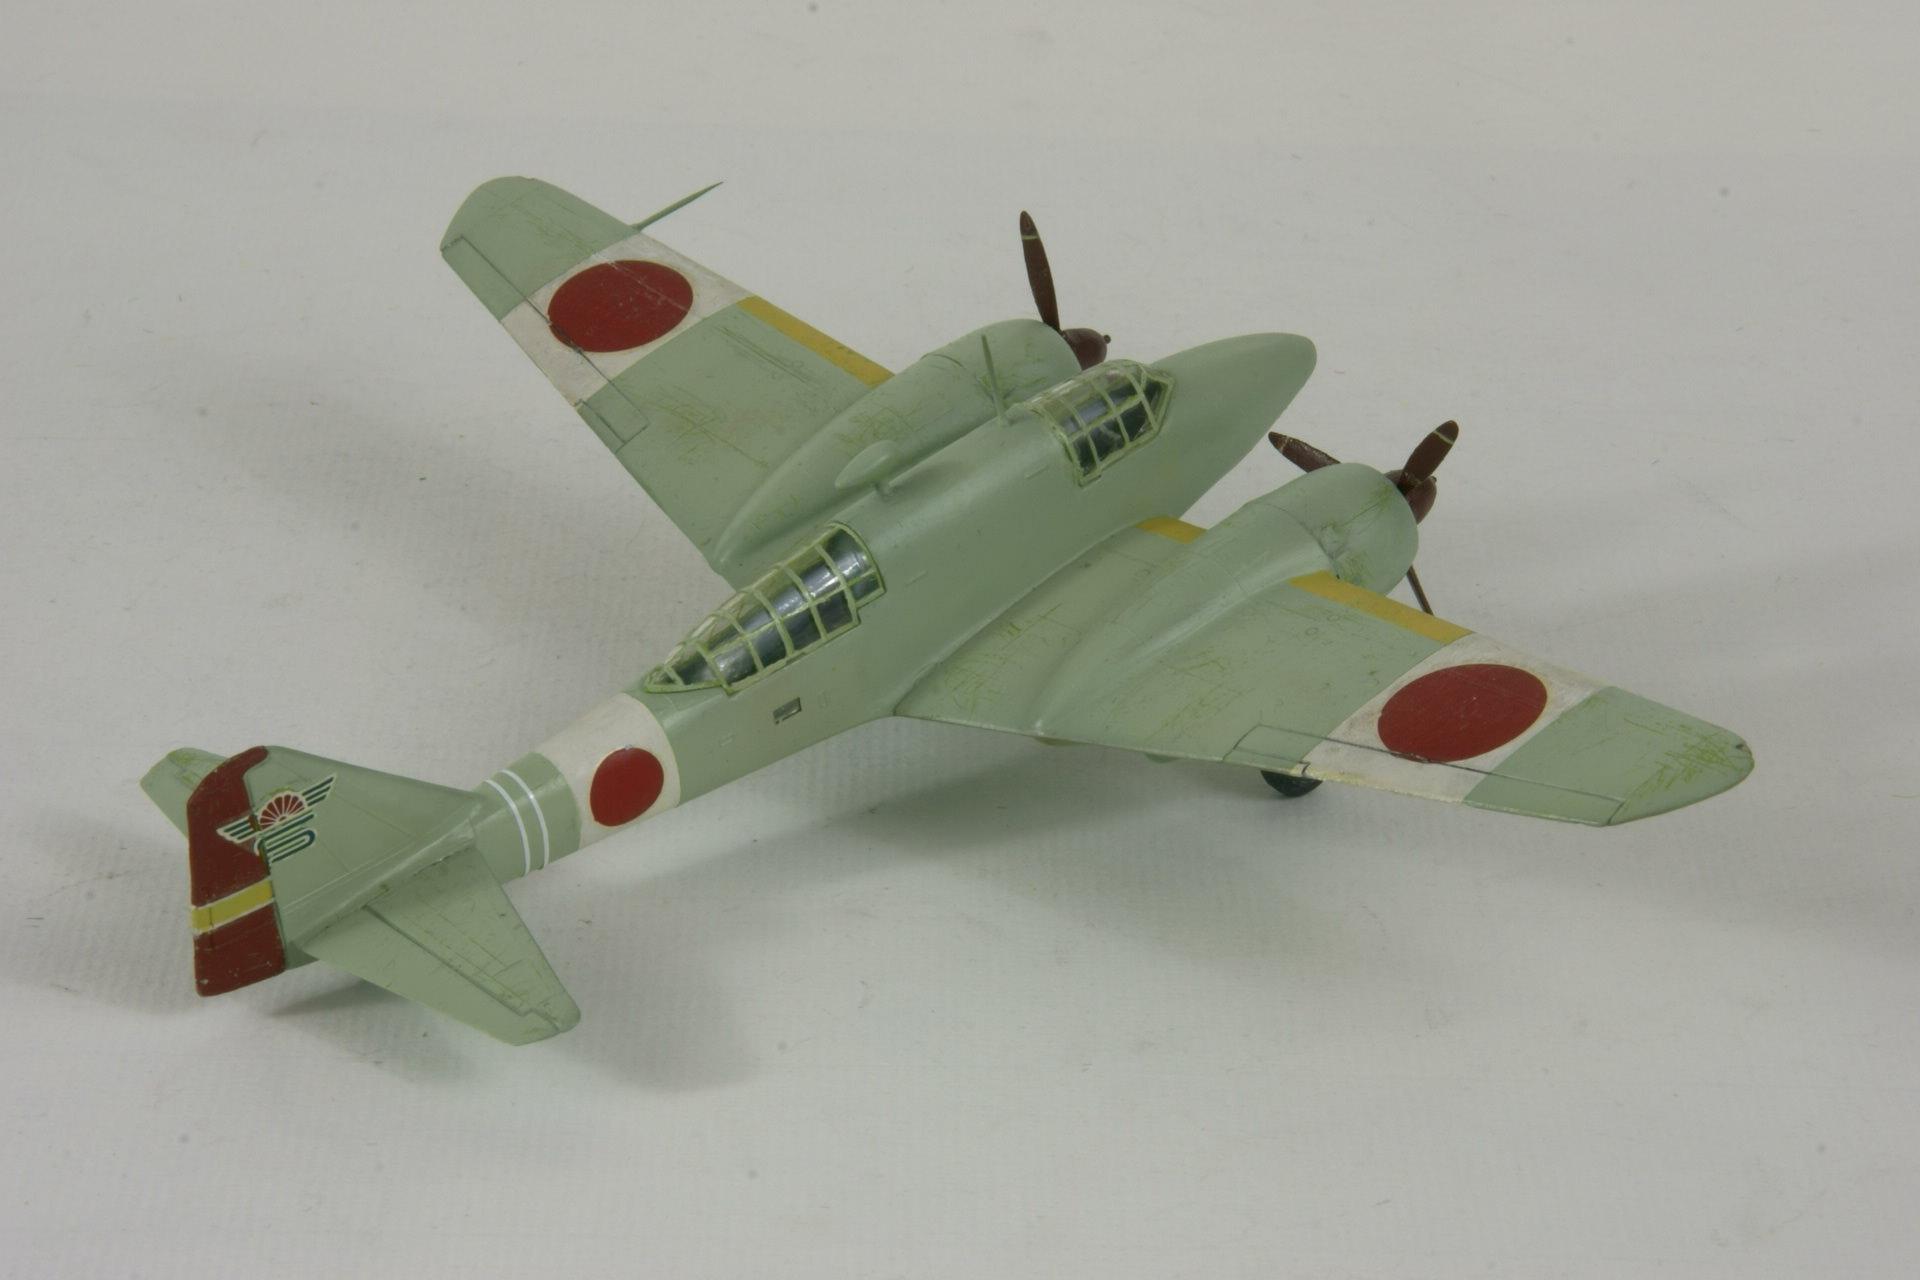 Mitsubishi ki 46 ii dinah 2 2